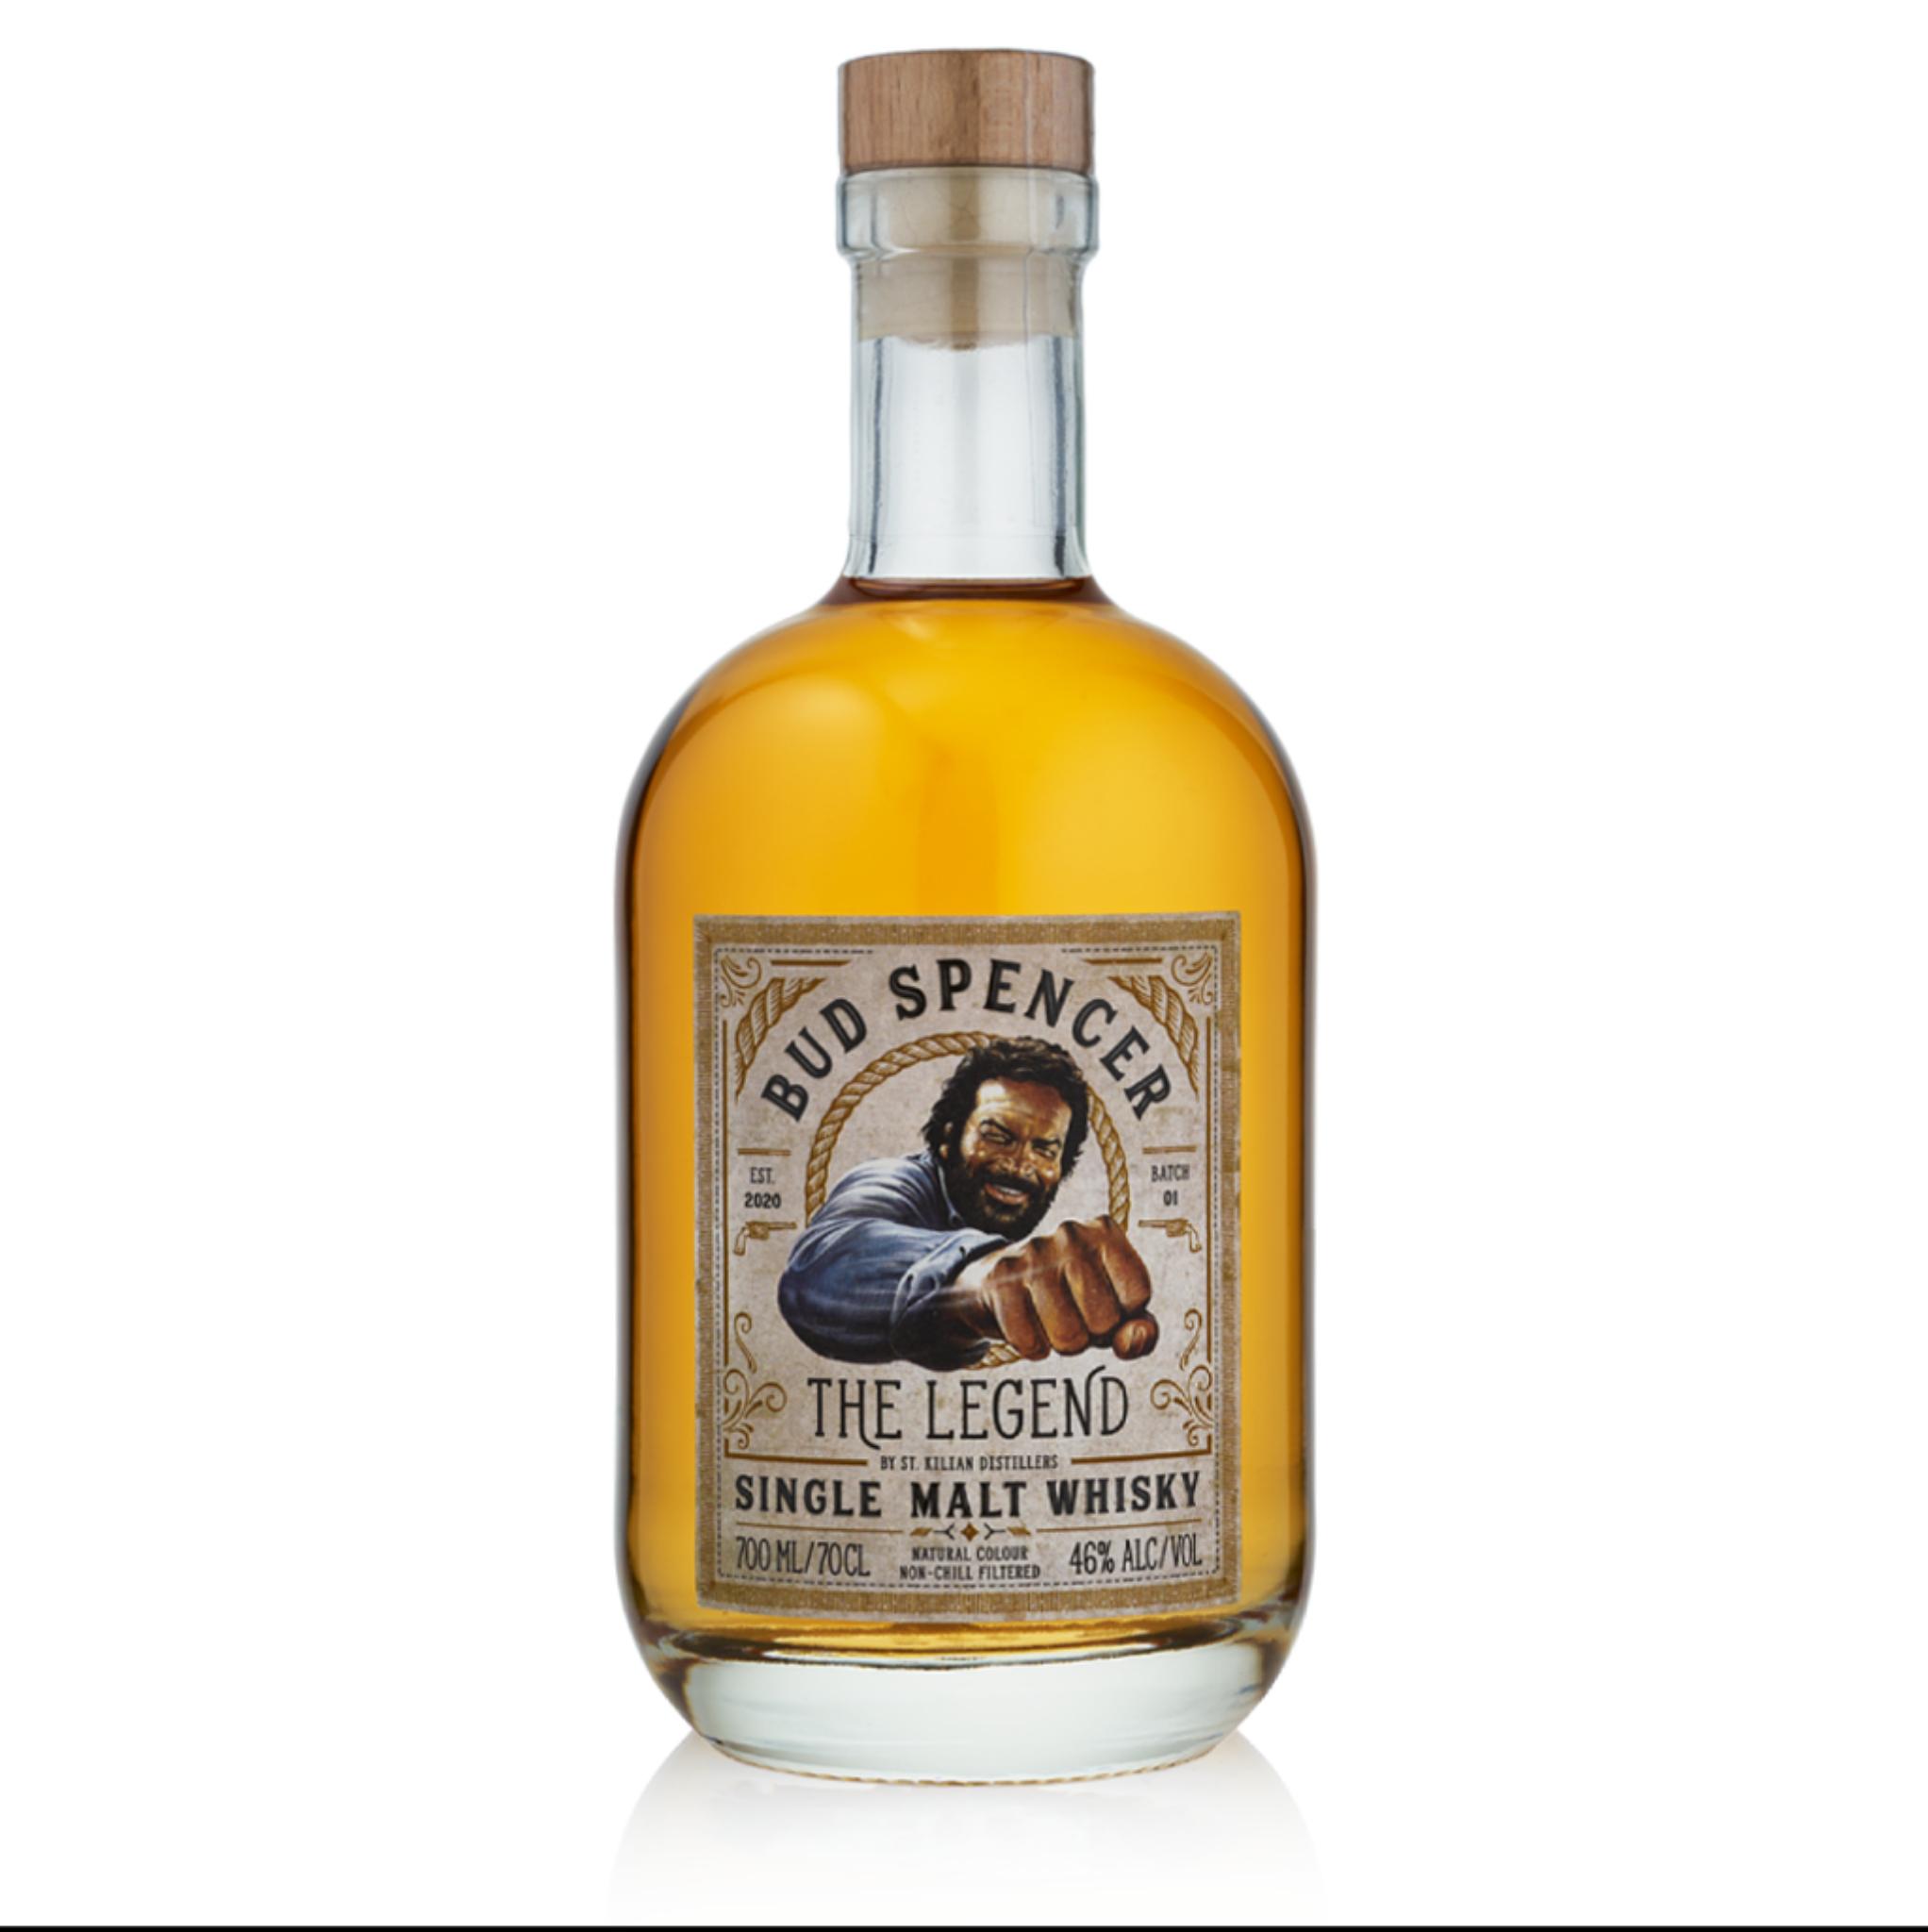 (Geschenkidee) Single Malt Whisky Bud Spencer - The Legend 0,7 l